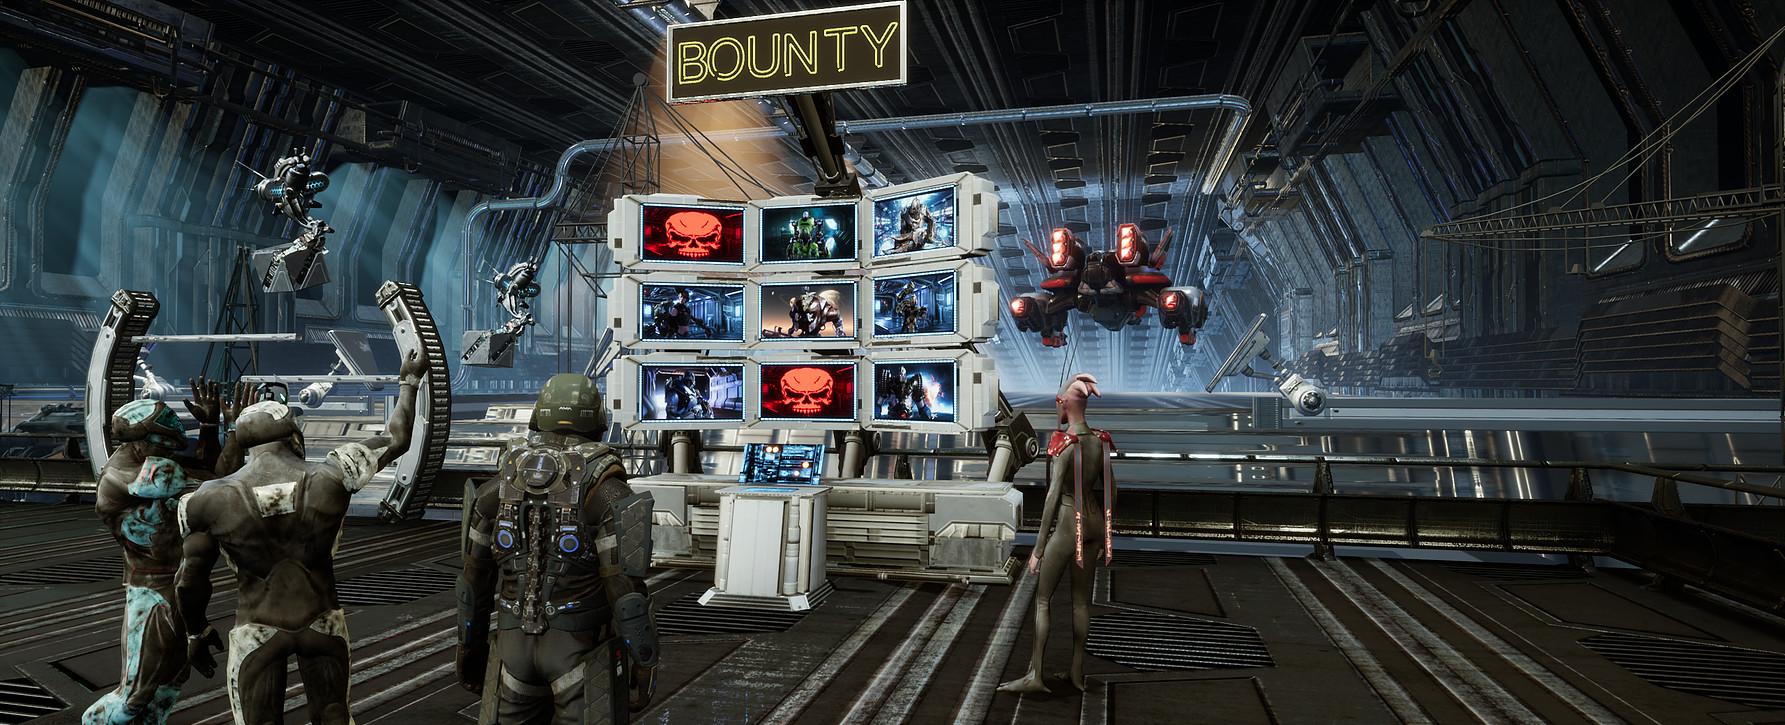 SpaceBourne Free Download